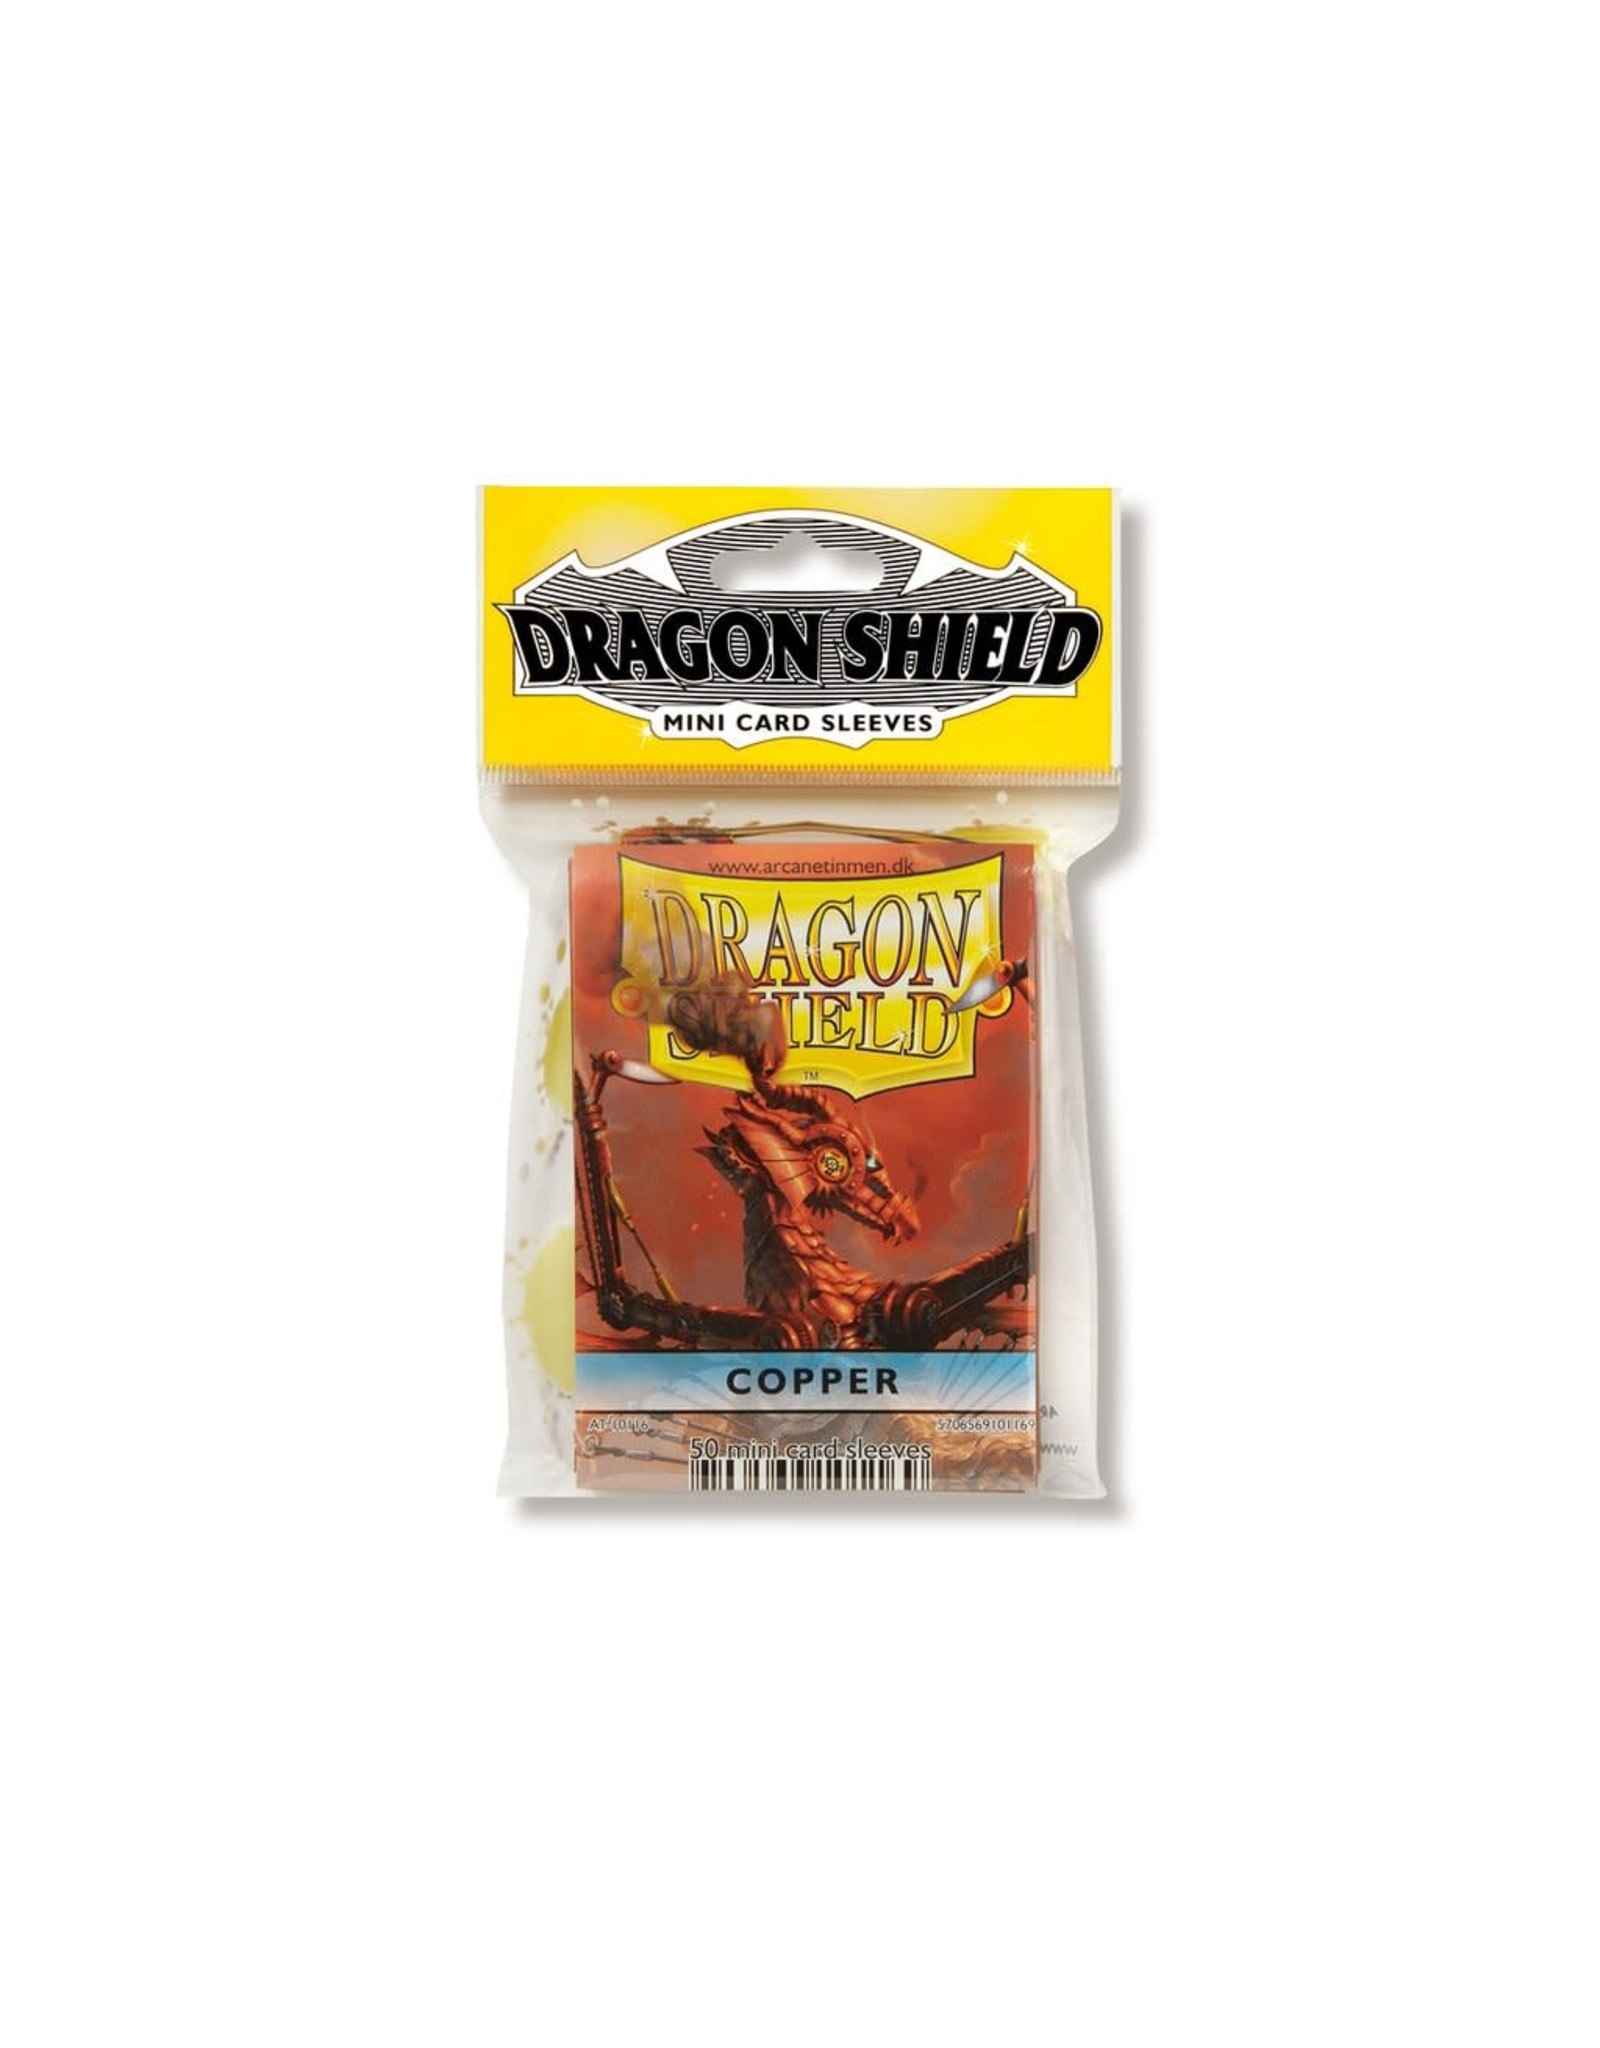 Dragon Shield Mini Sleeves - Copper (50 ct. in bag)